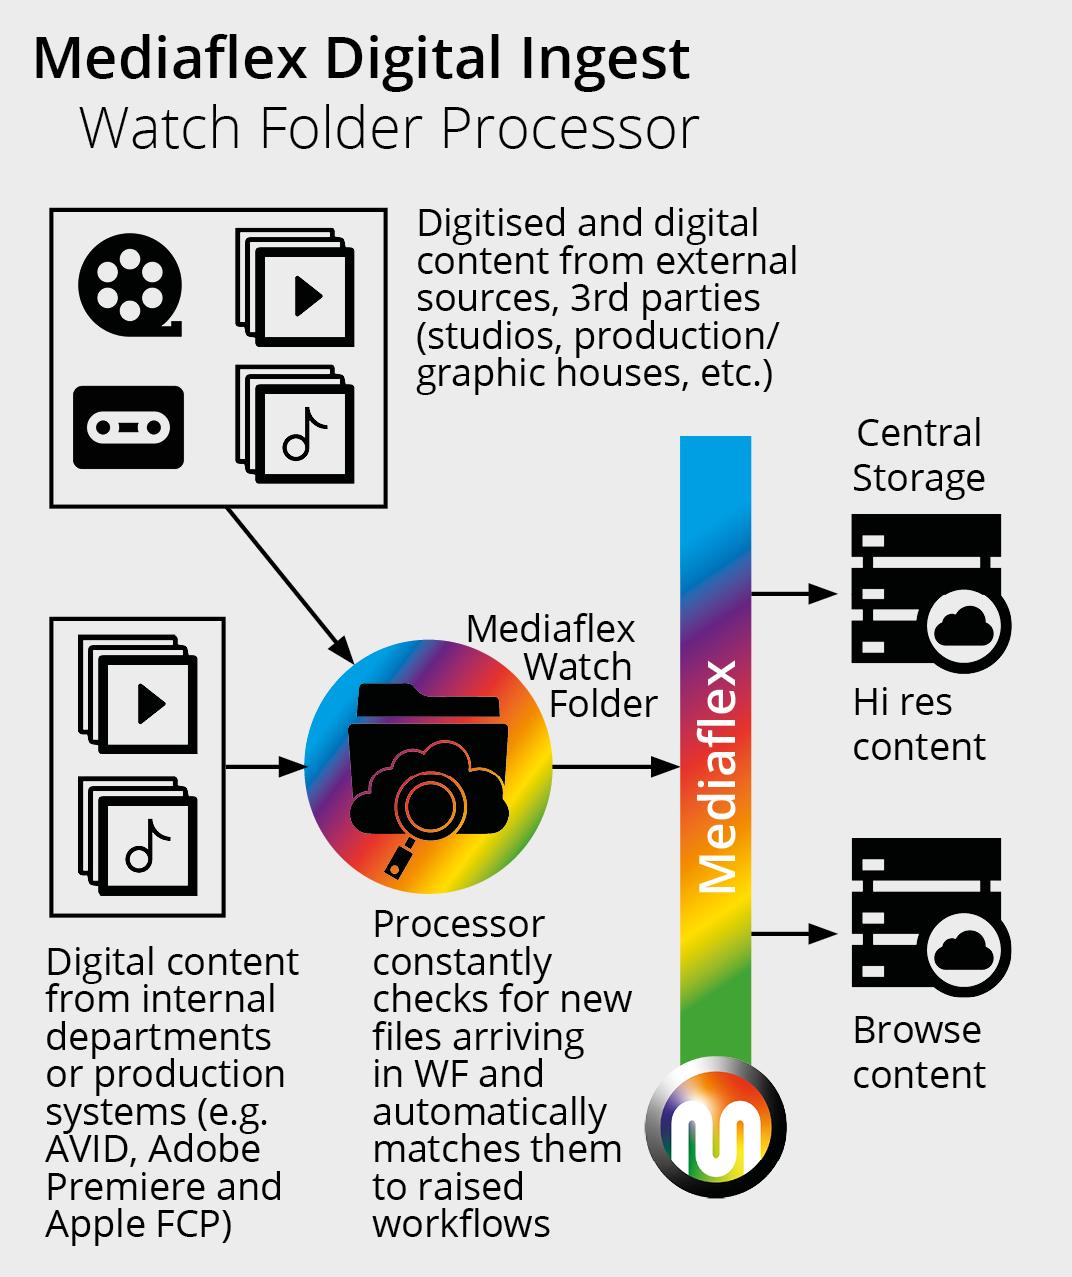 Mediaflex Digital Ingest